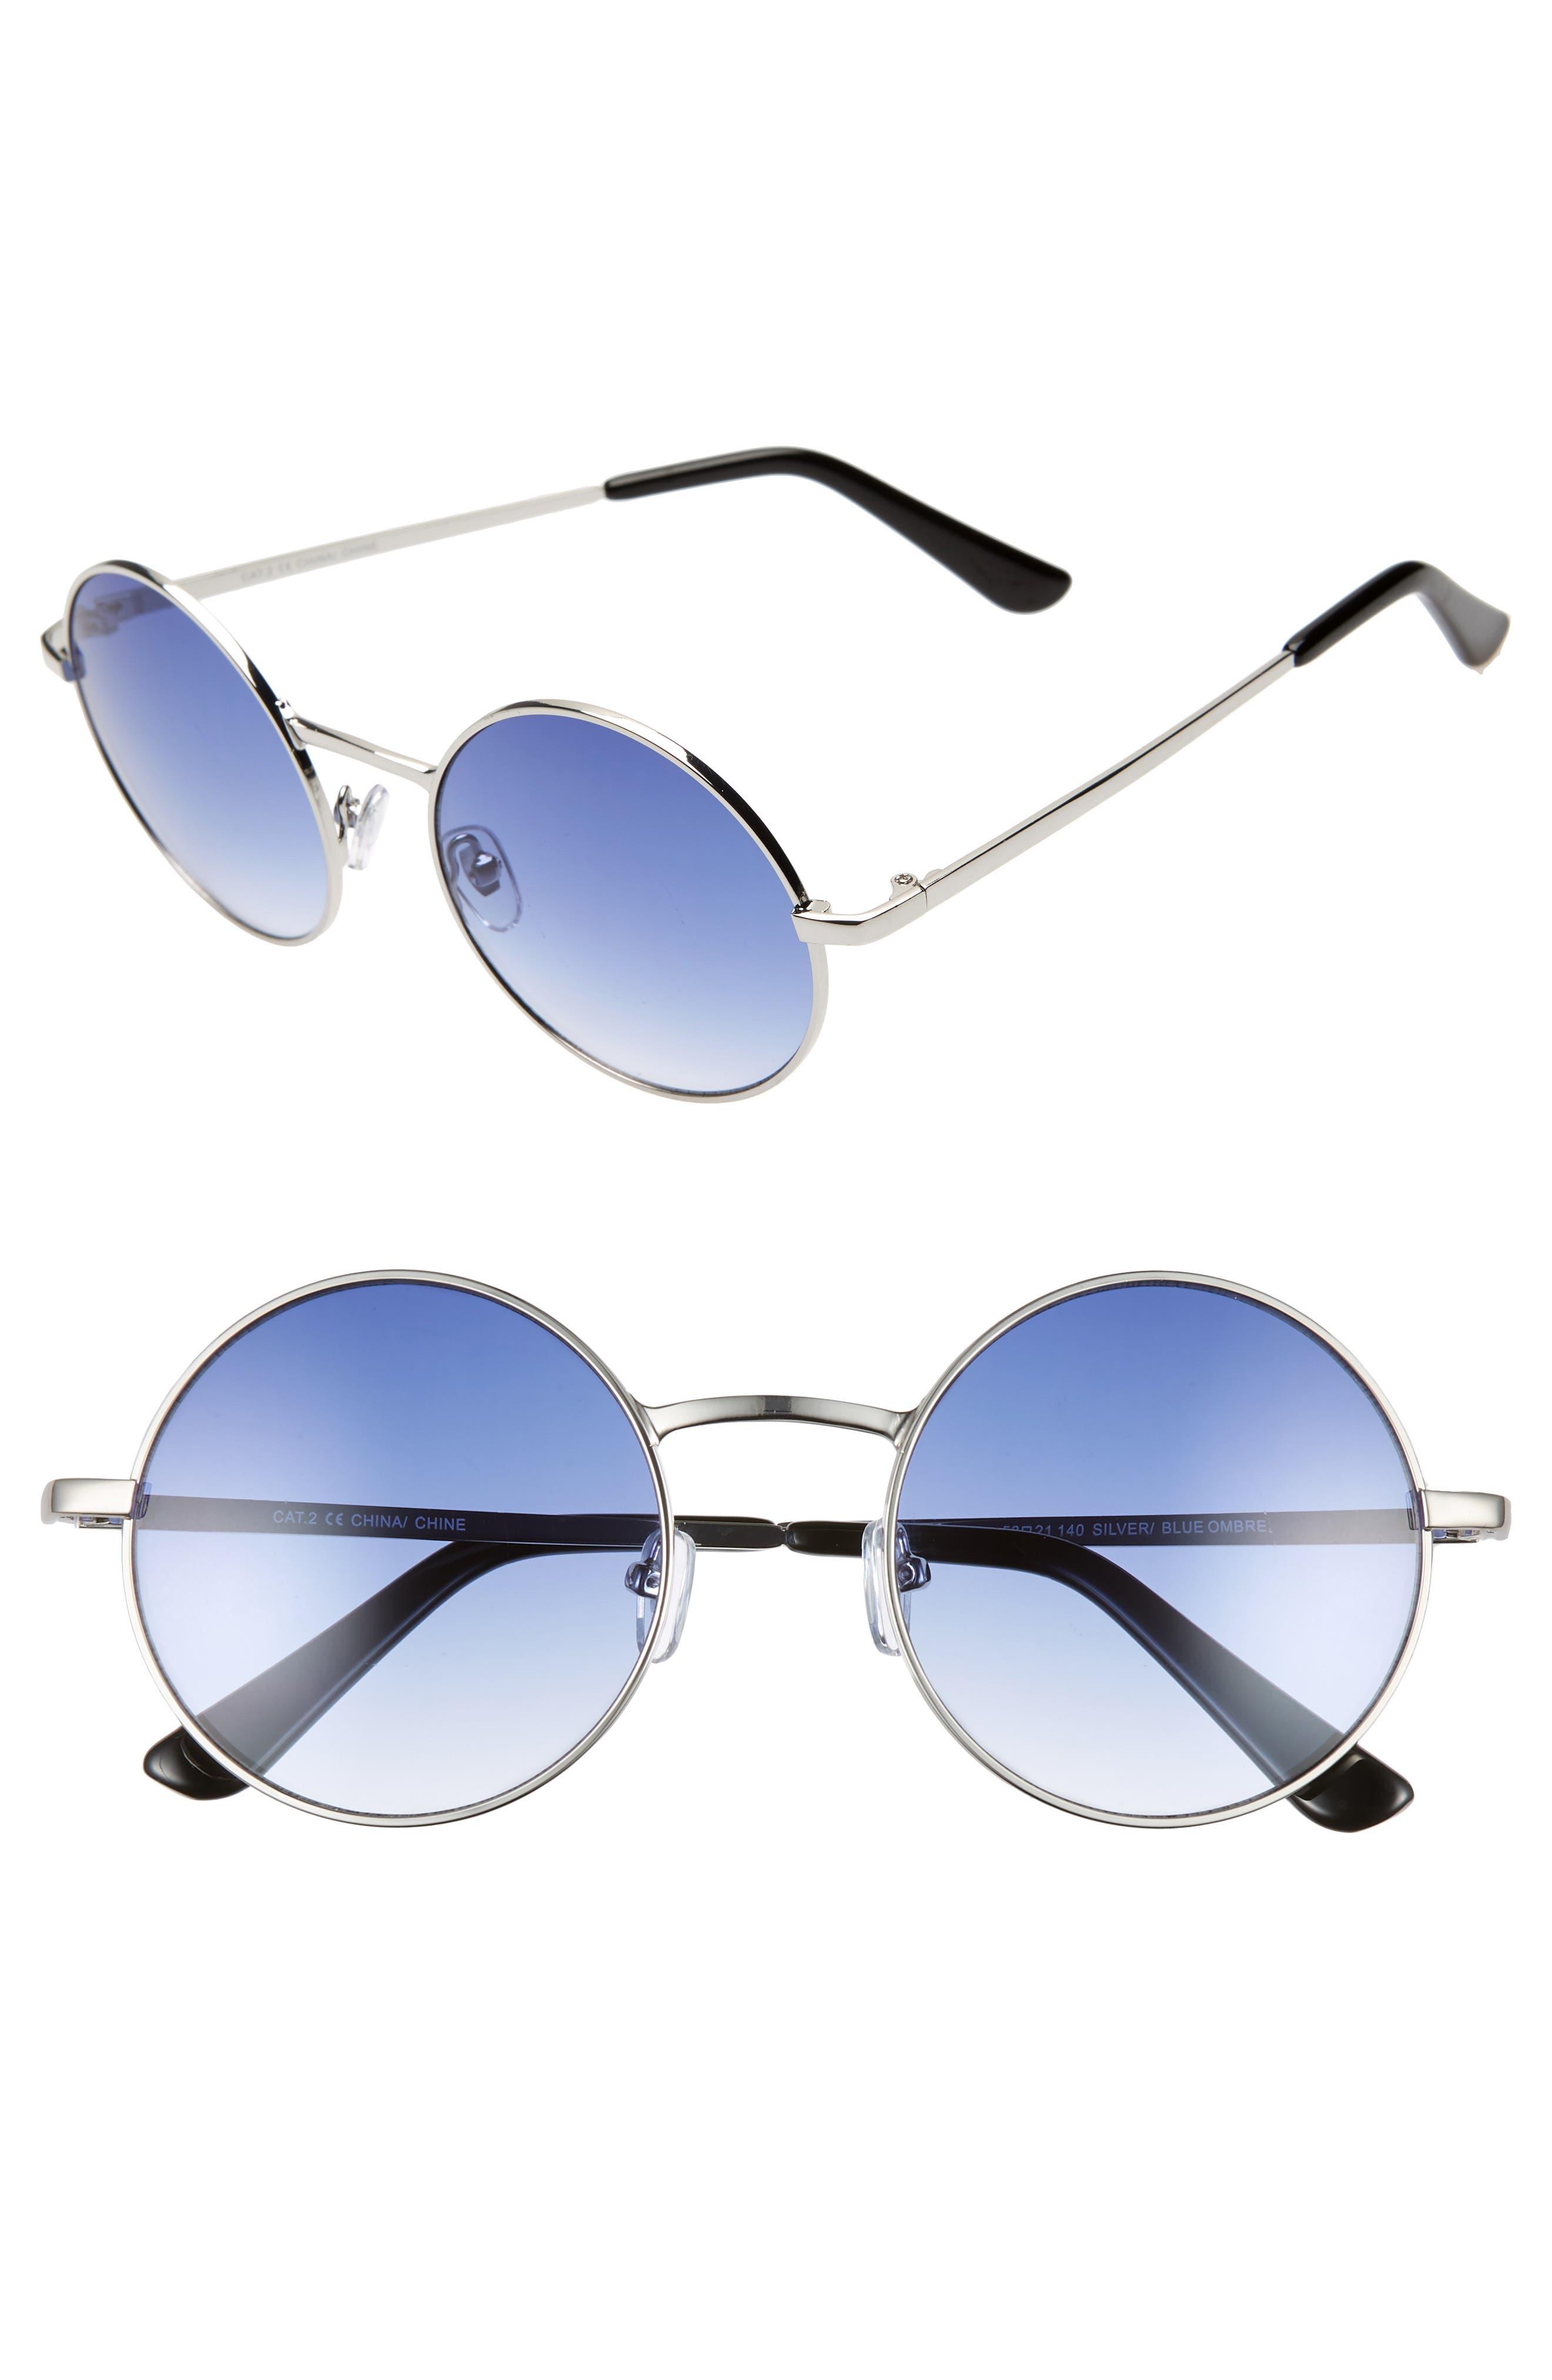 THE RAIL Lenny 53mm Round Sunglasses, Main, color, SILVER/ BLUE OMBRE